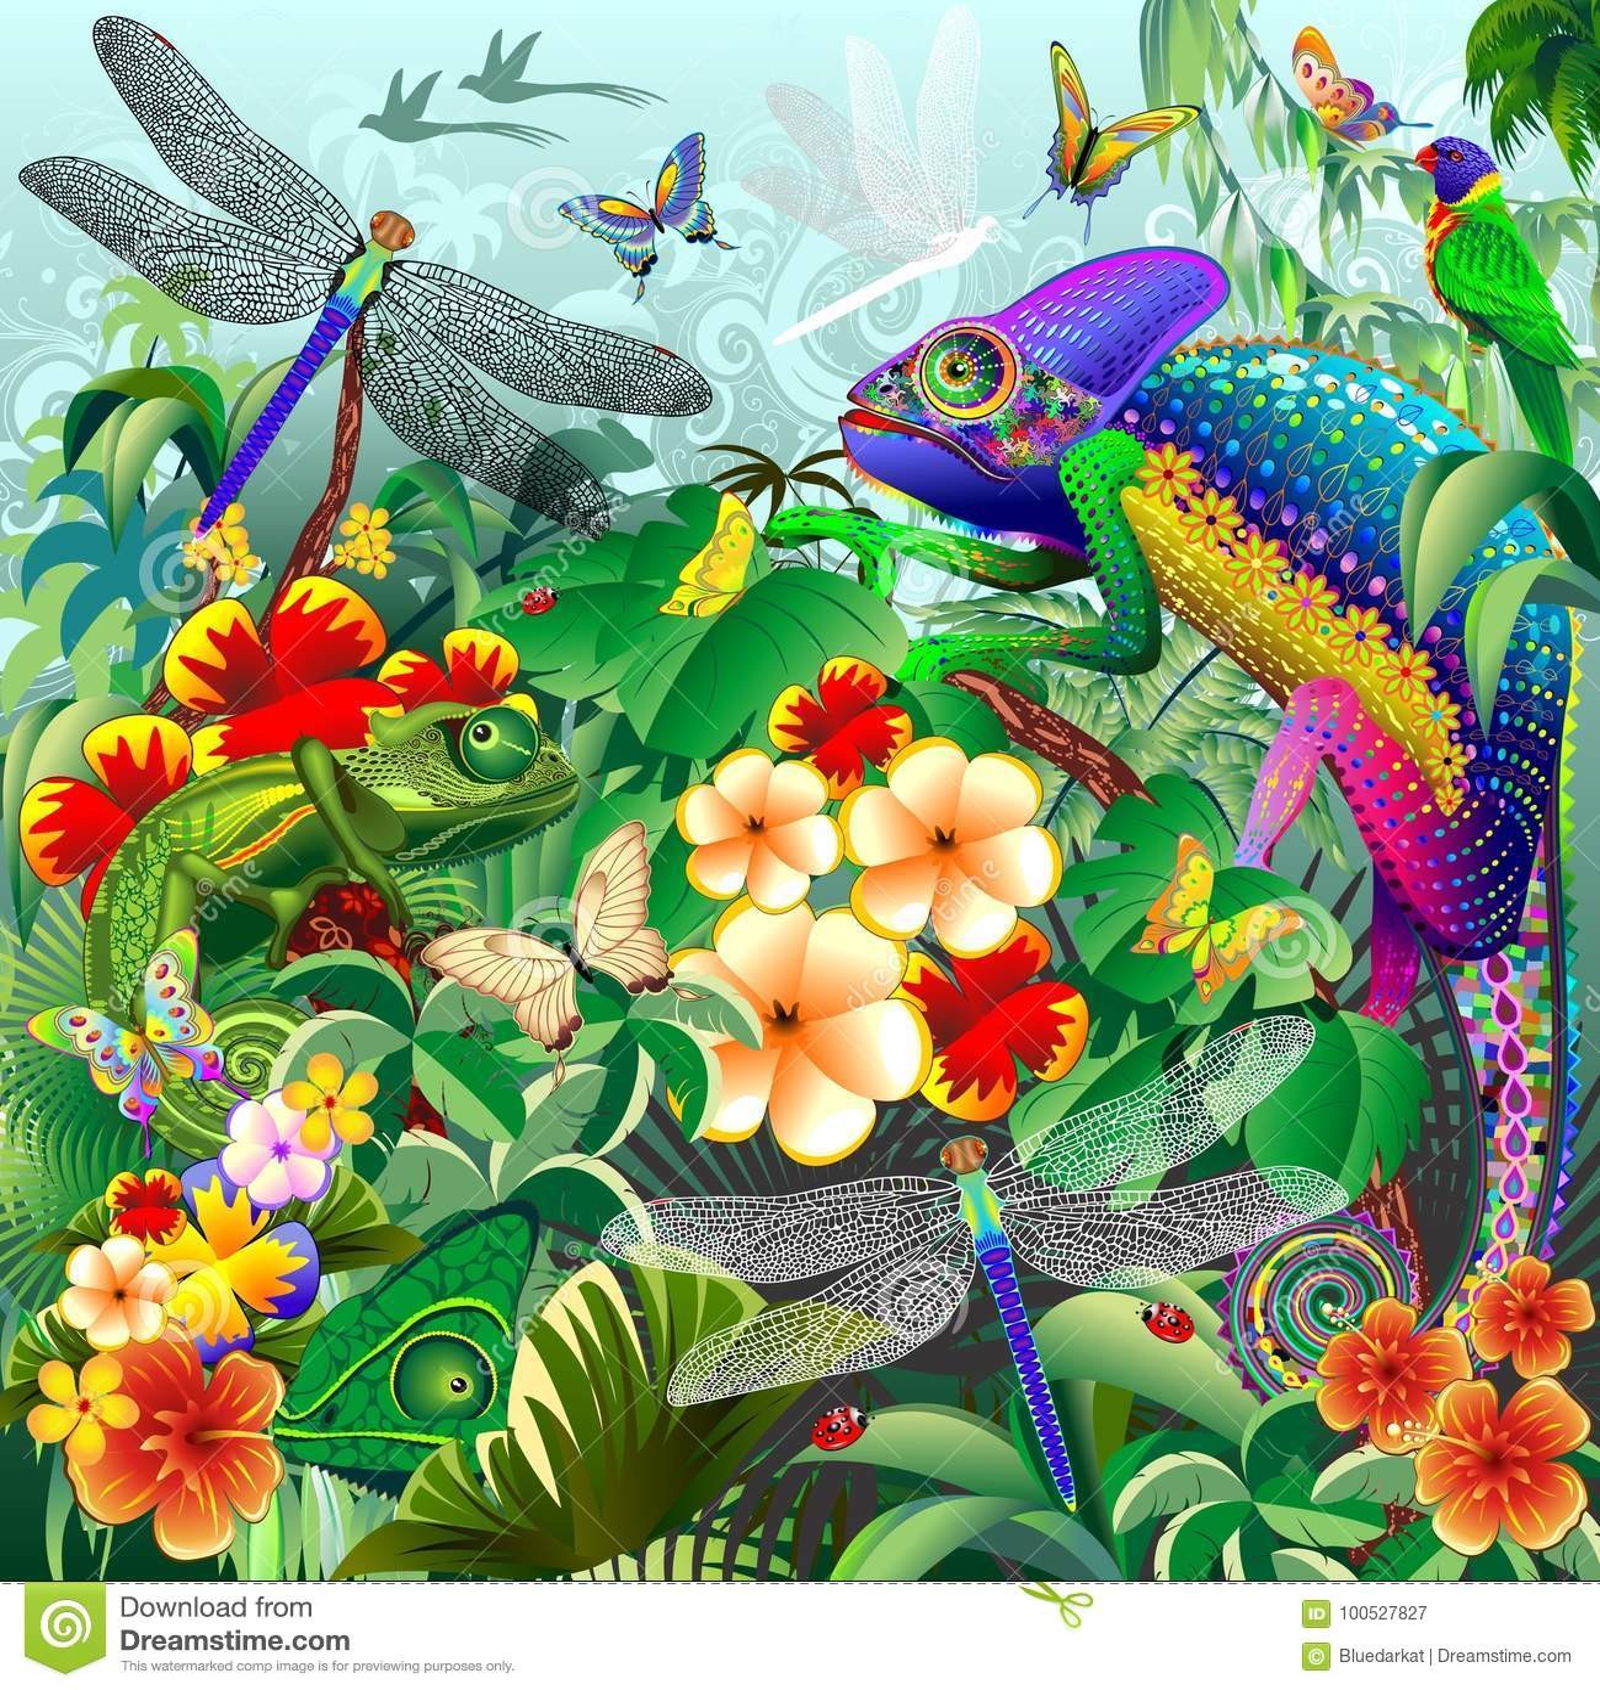 Chameleons Hunting, Dragonflies, Butterflies, Ladybugs